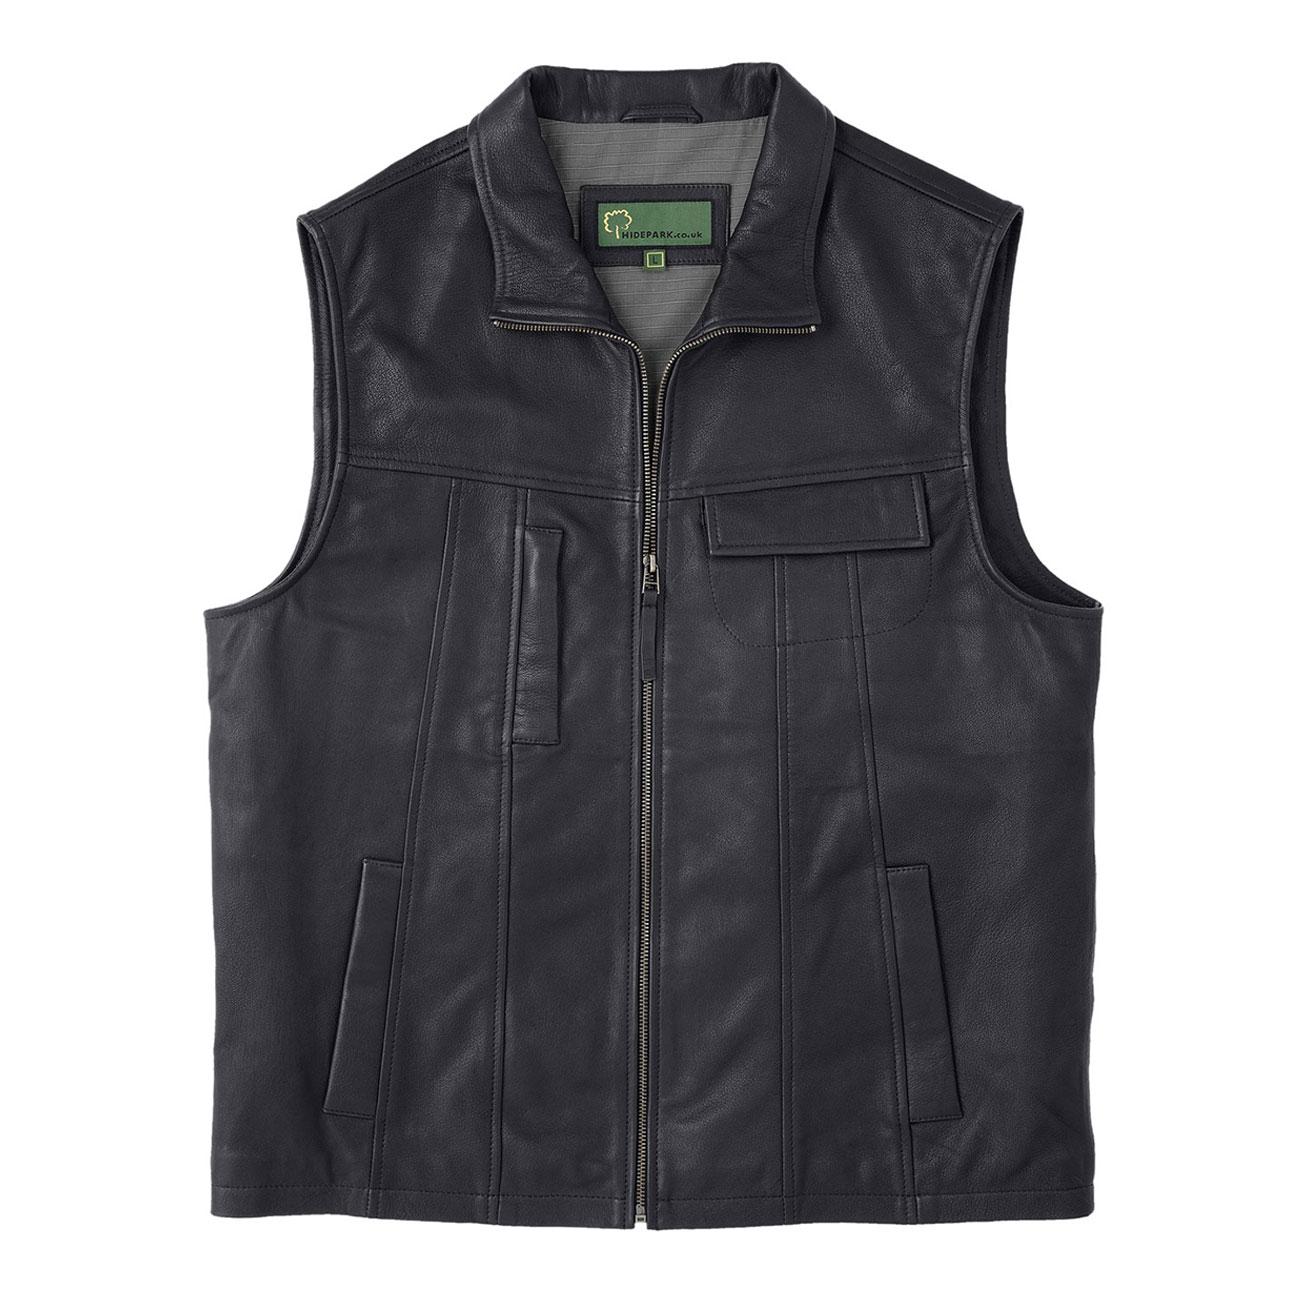 Gents Leather Vest Black Stan